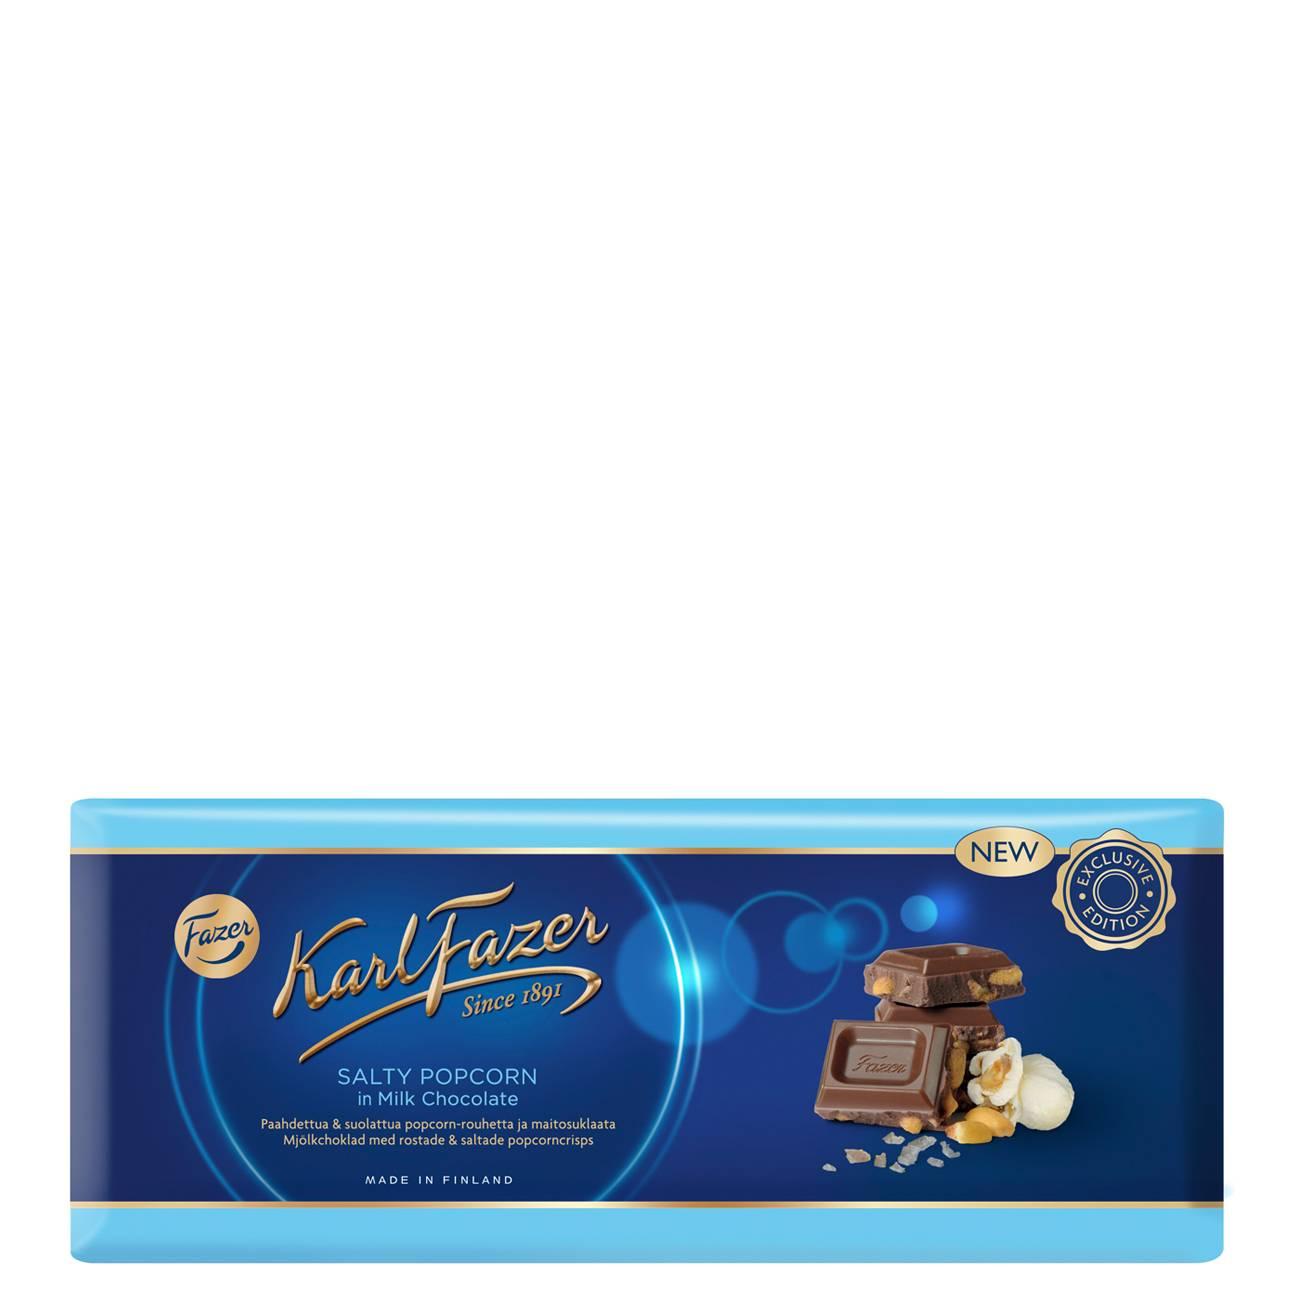 SALTY POPCORN IN MILK CHOCOLATE 250 Grame